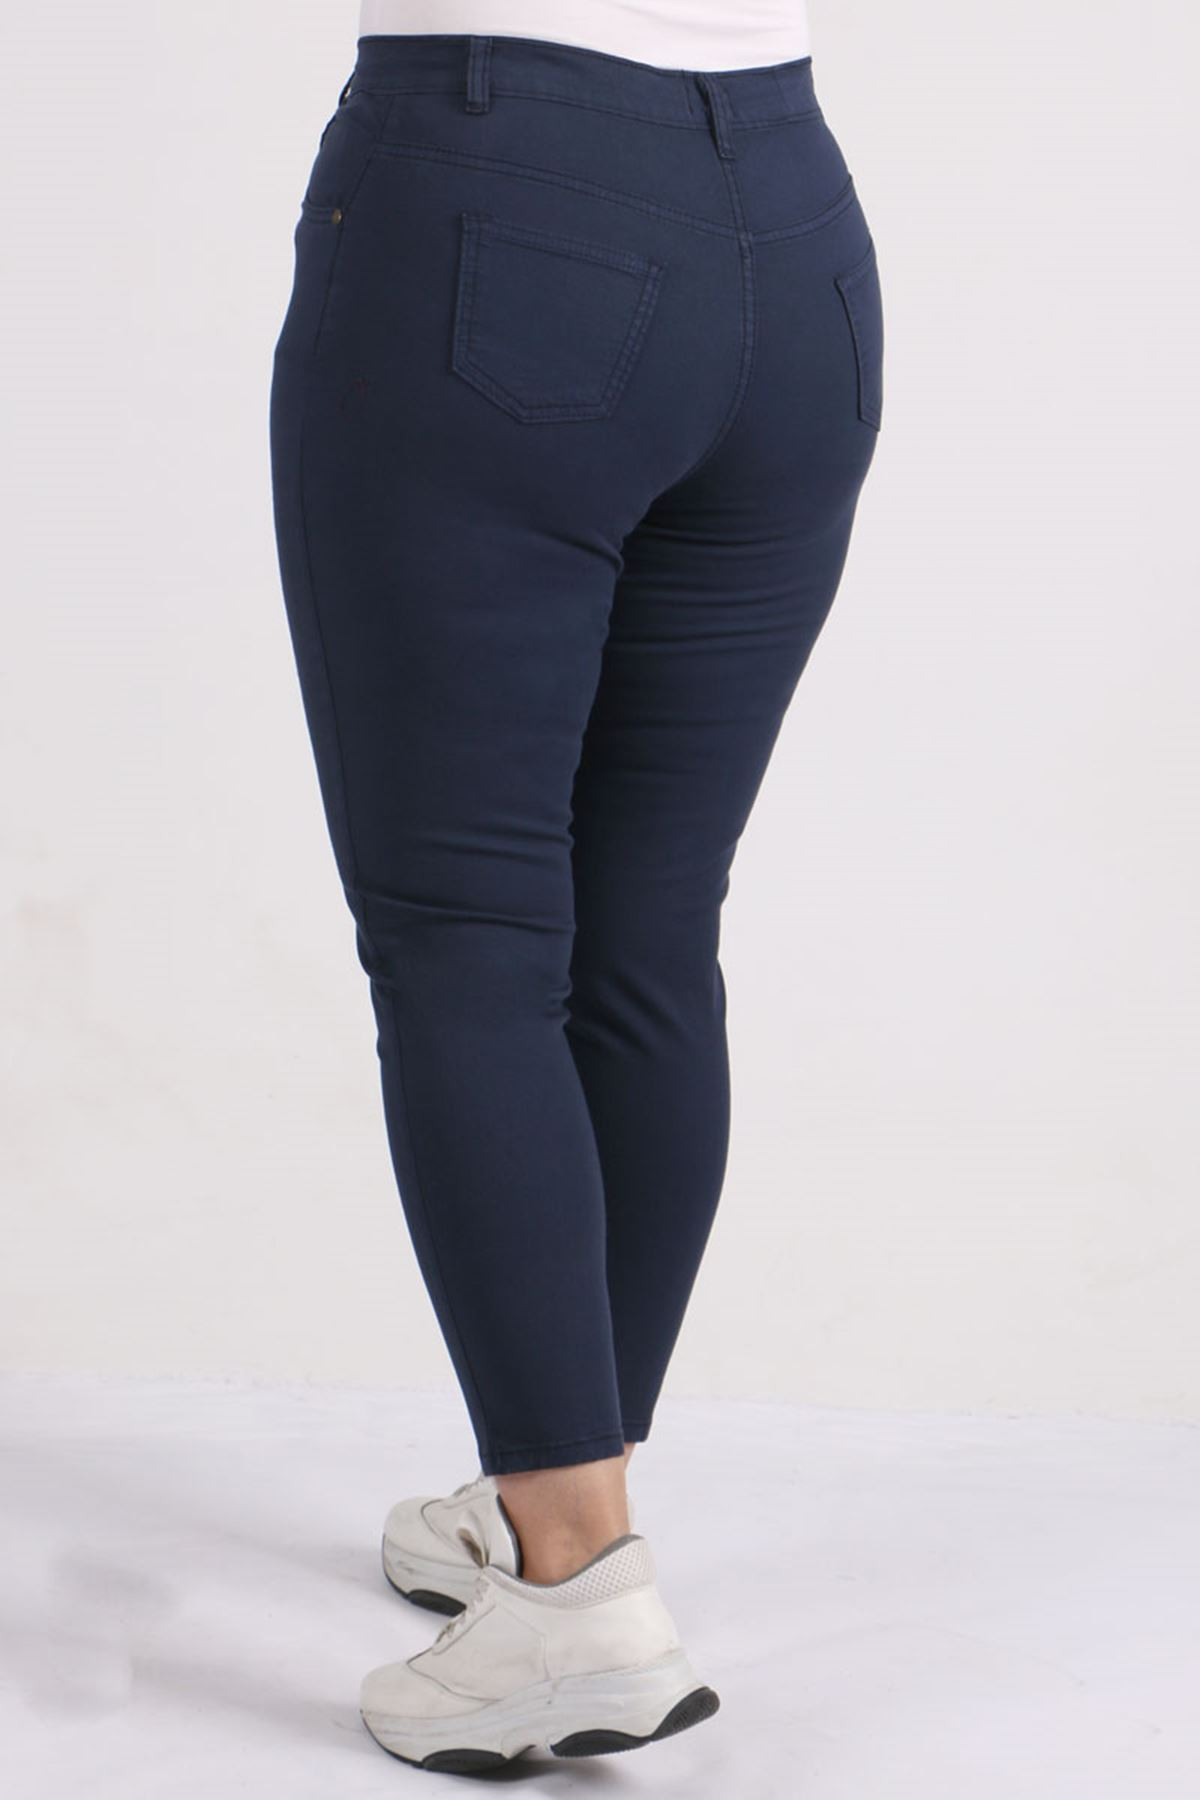 9115 Plus Size Skinny Leg Pants - Navy blue